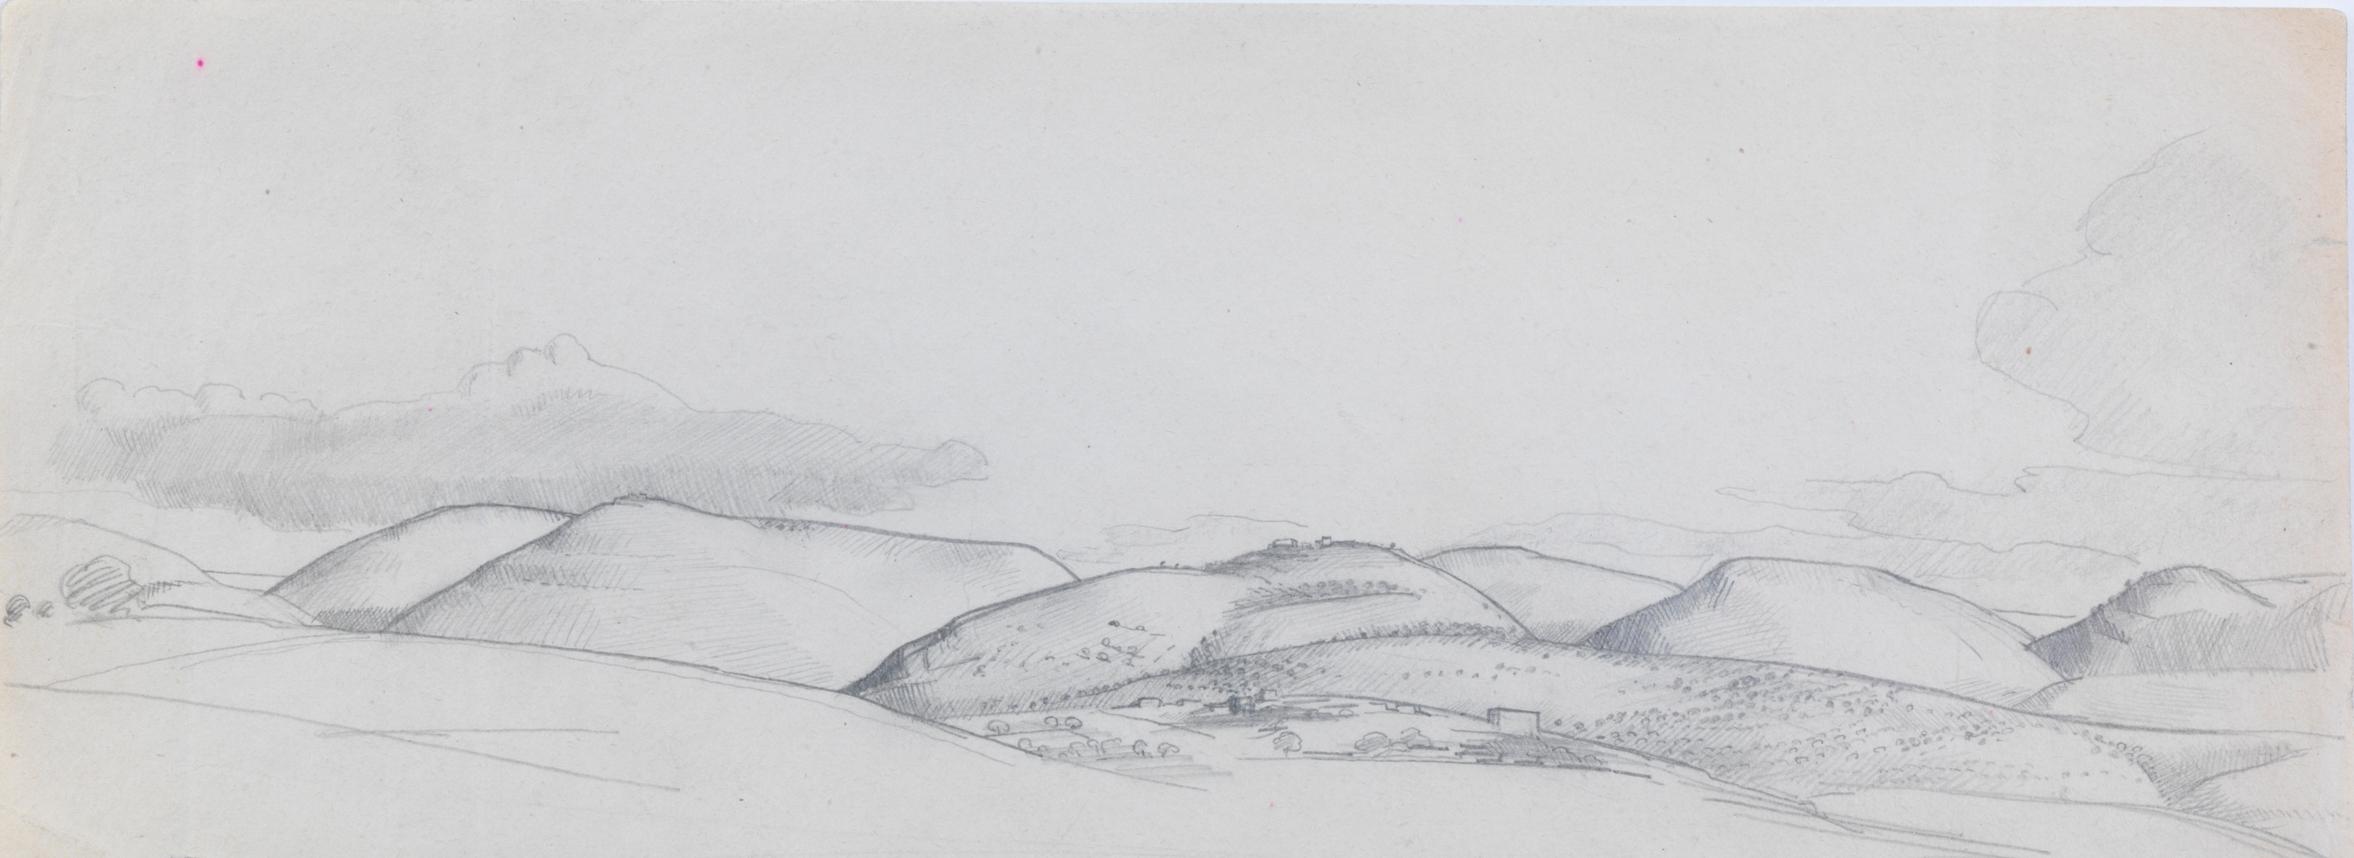 Henry_Lamb_Sketch-of-hills-Z10, 10.2 x 26.8 cm,